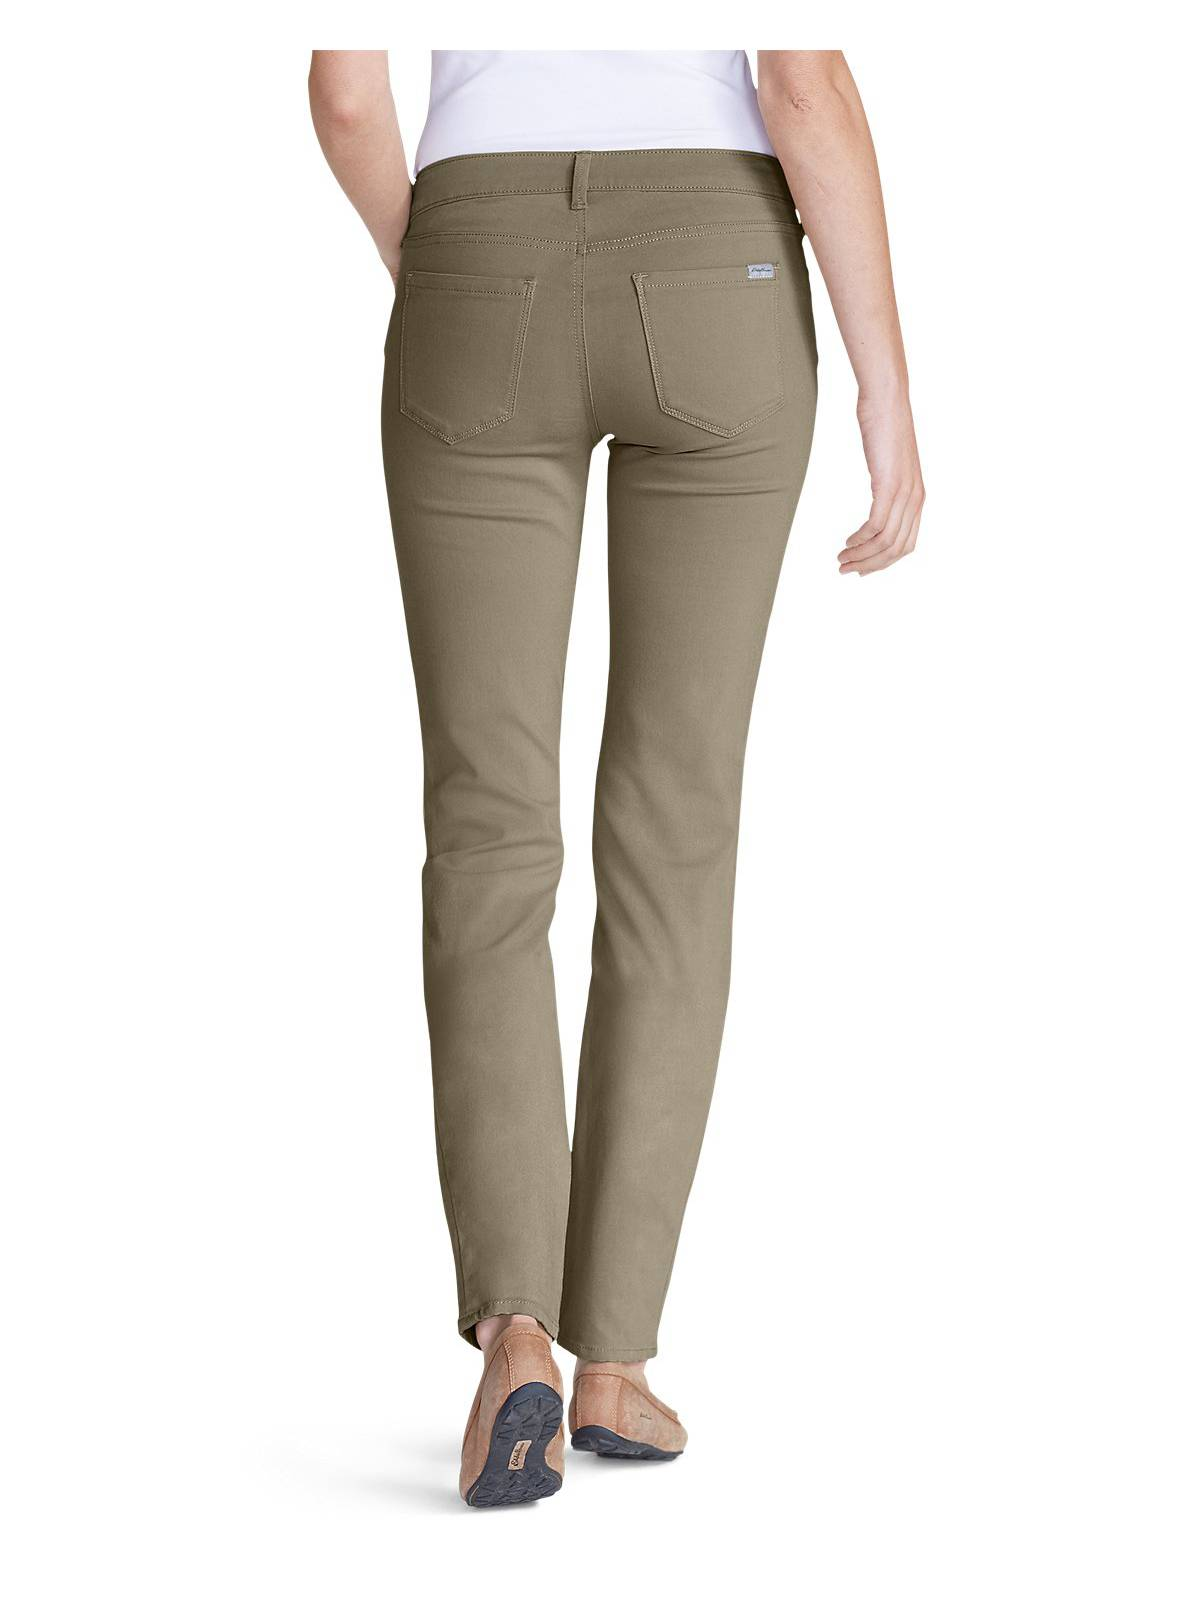 4515b2d211f Eddie Bauer Women's Elysian Twill Slim Straight Jeans - Slightly ...